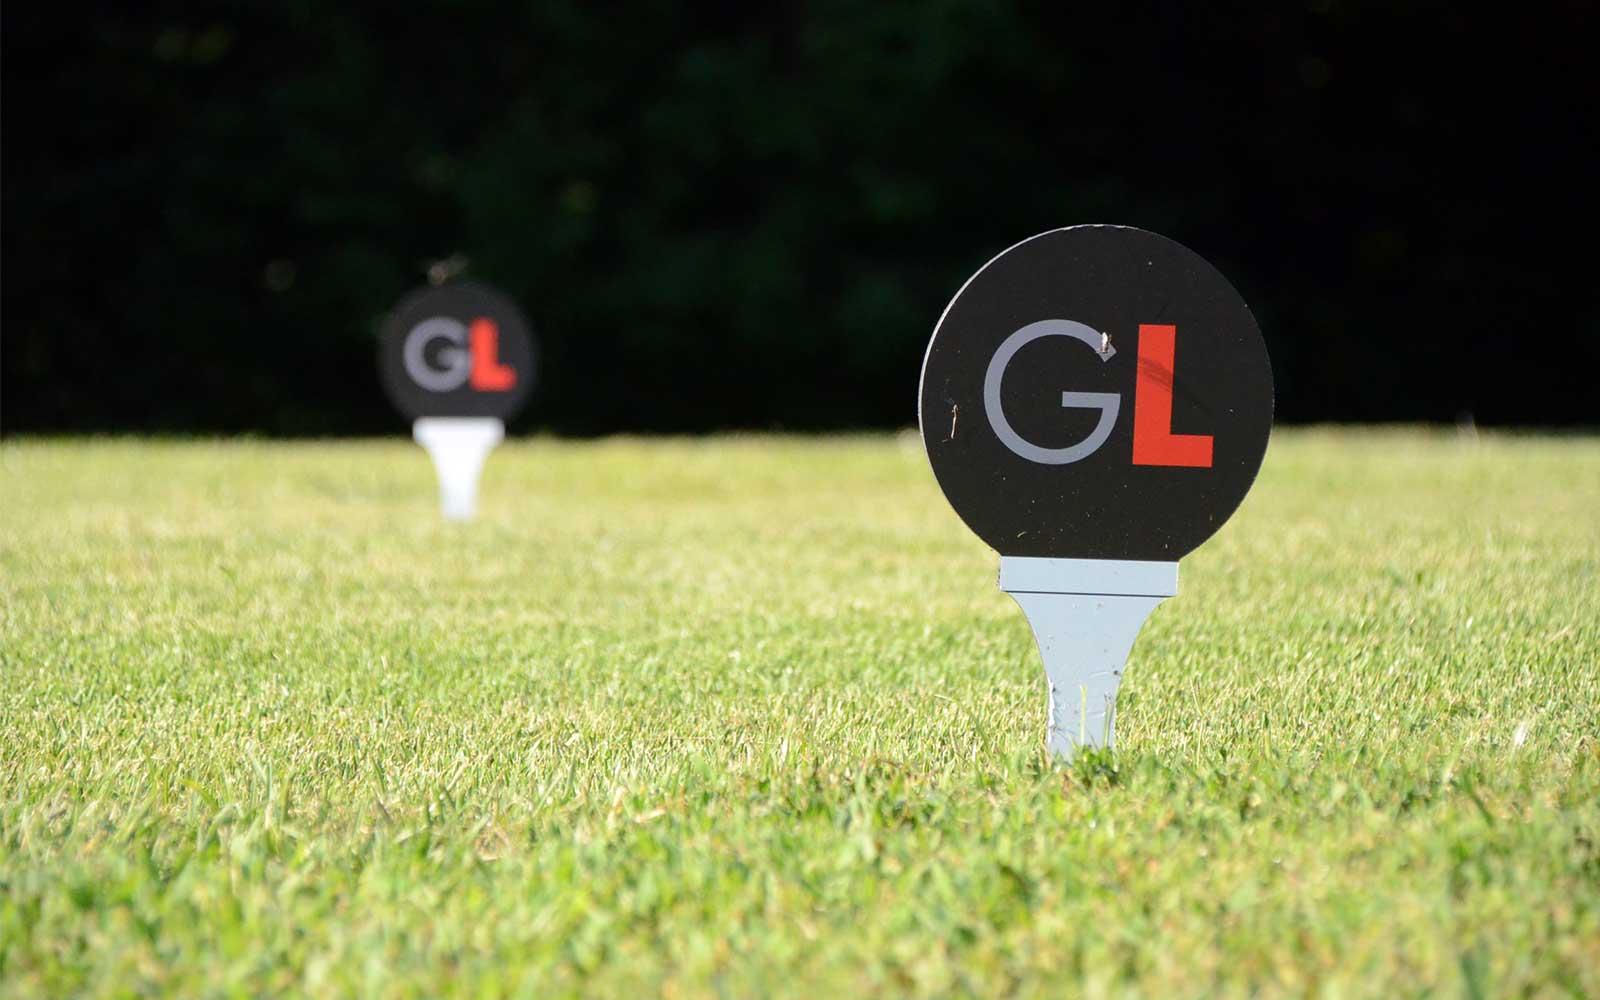 Royal-Meadows-Golf-Club,-Kansas-City,-MO-Tee-Markers